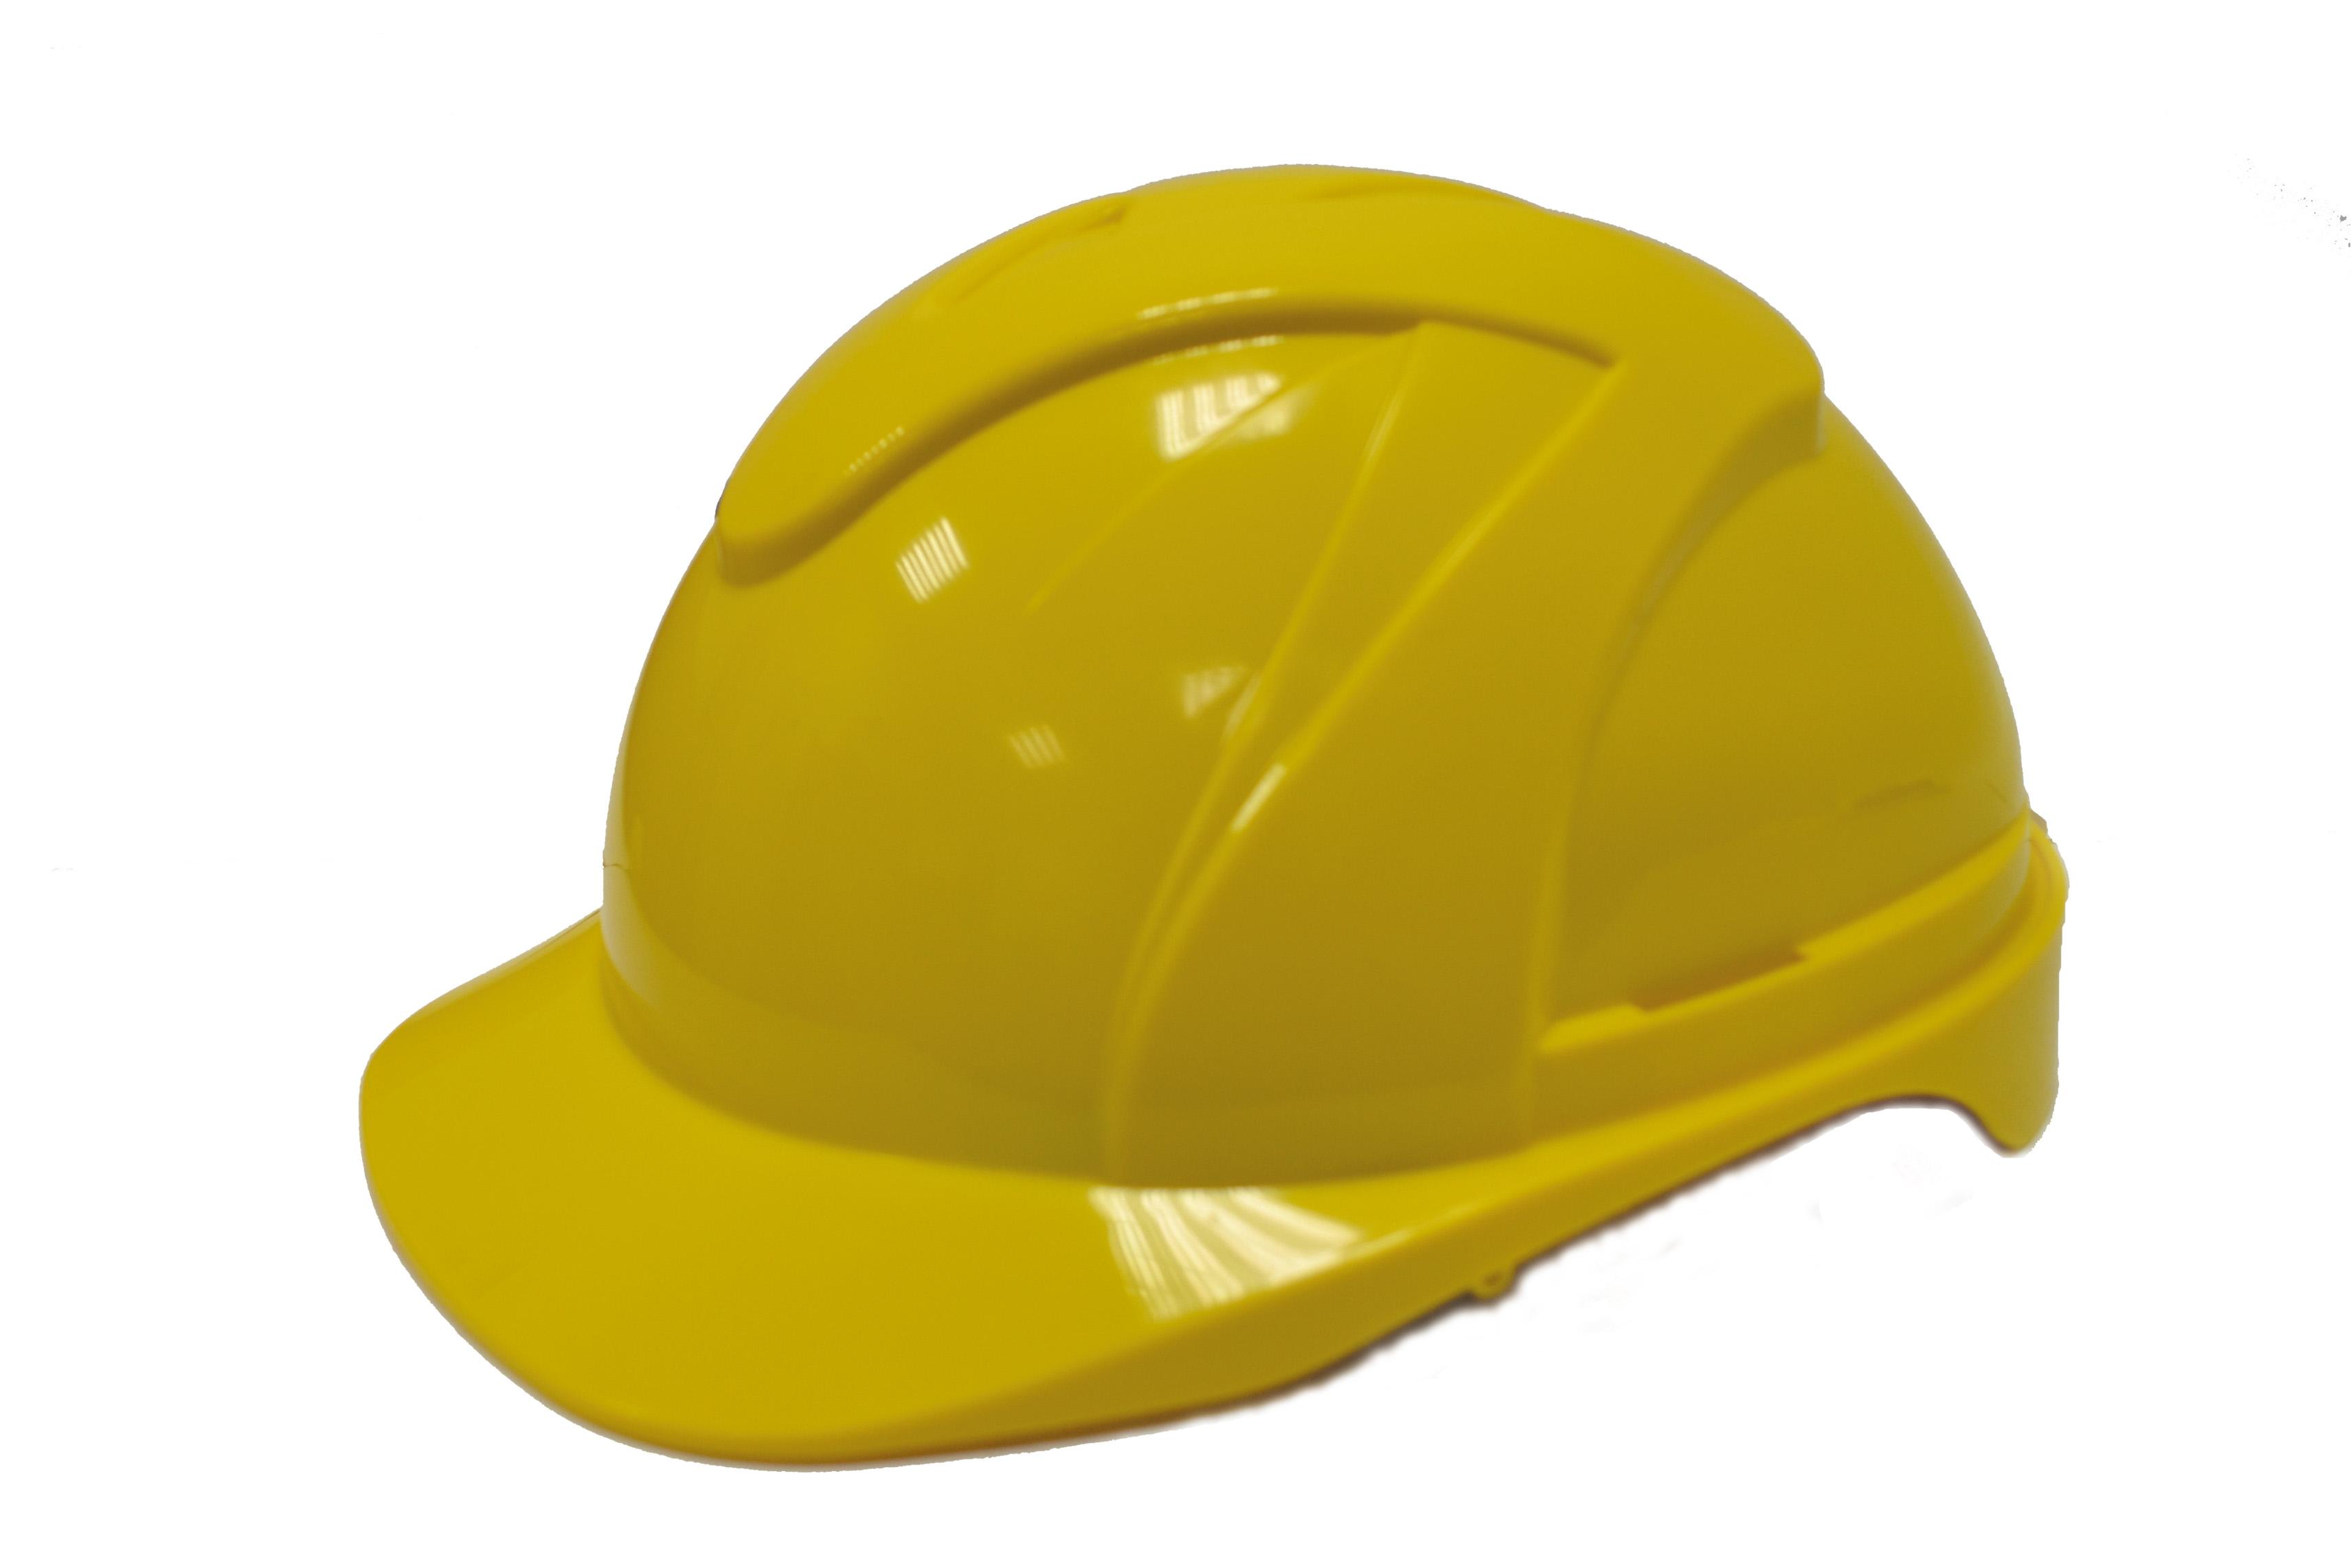 yellow hard hat clipart - photo #14